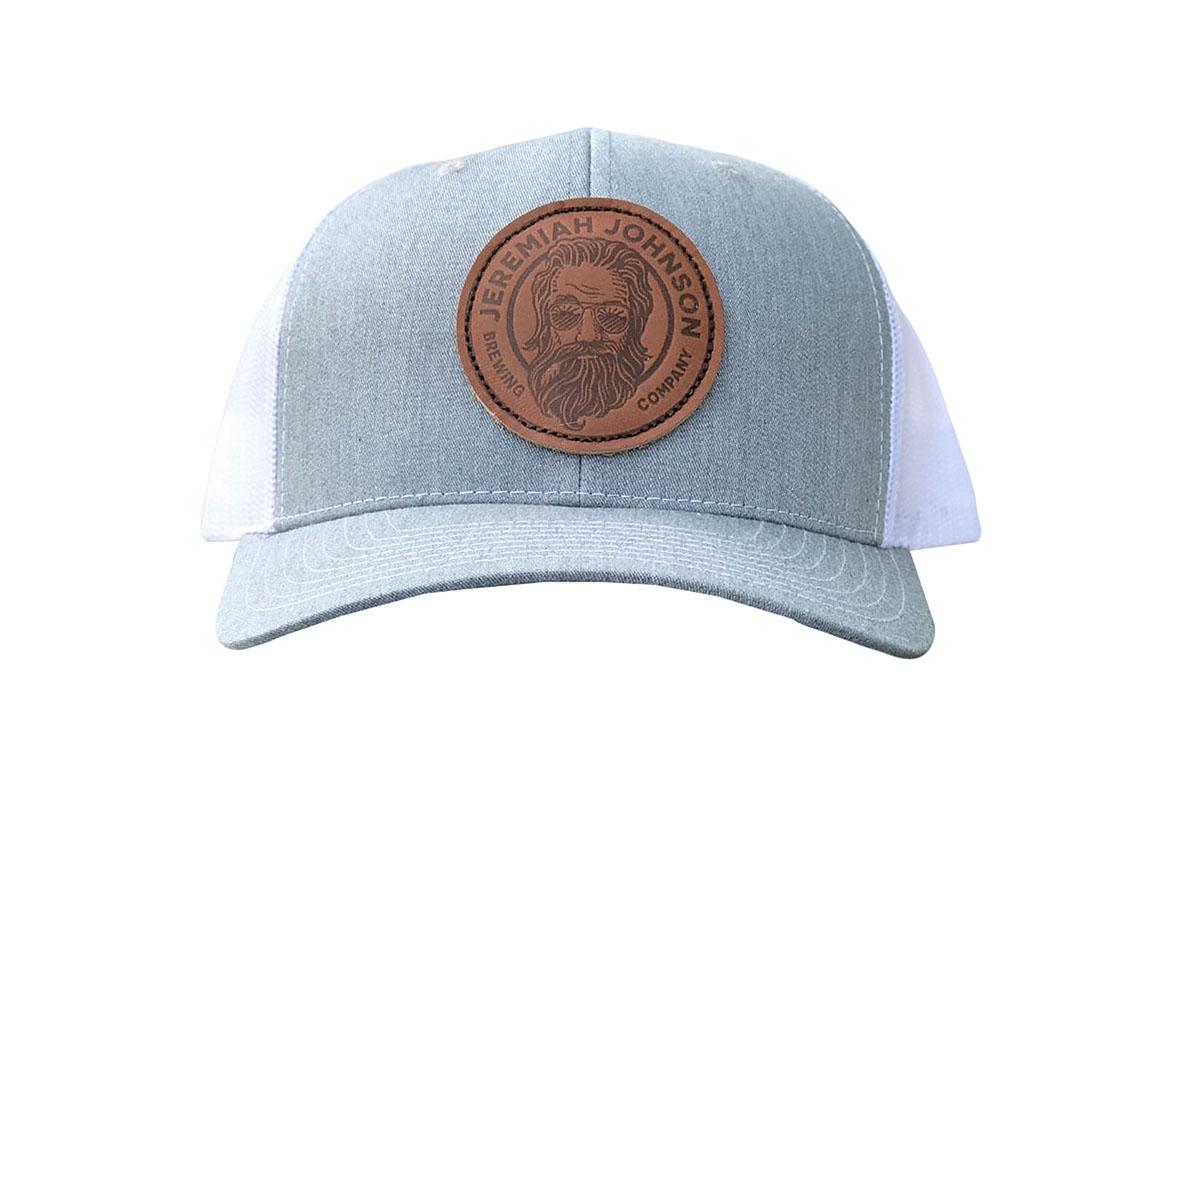 TwentyFour Store cap patching image